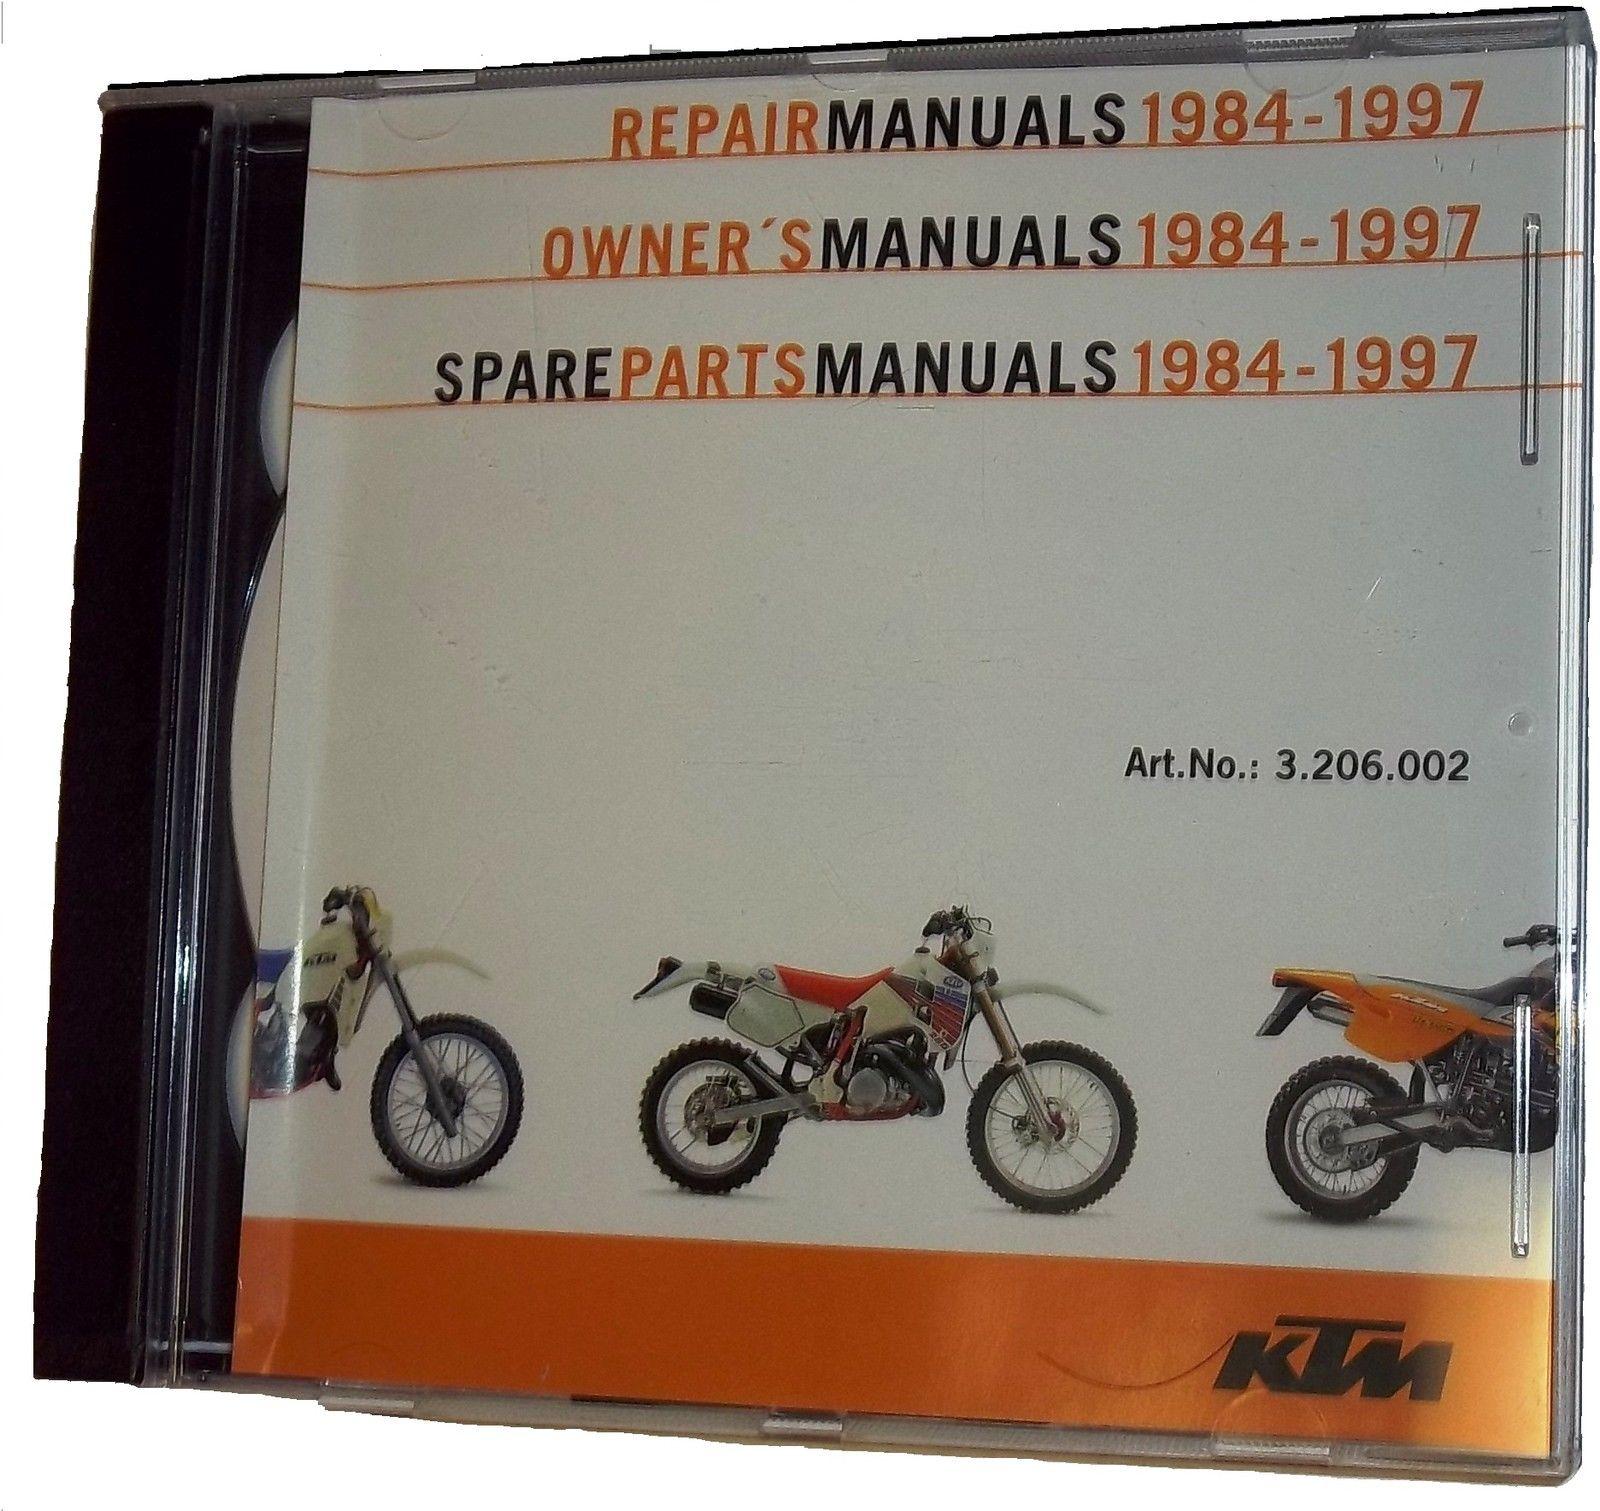 www.ktm-parts.com